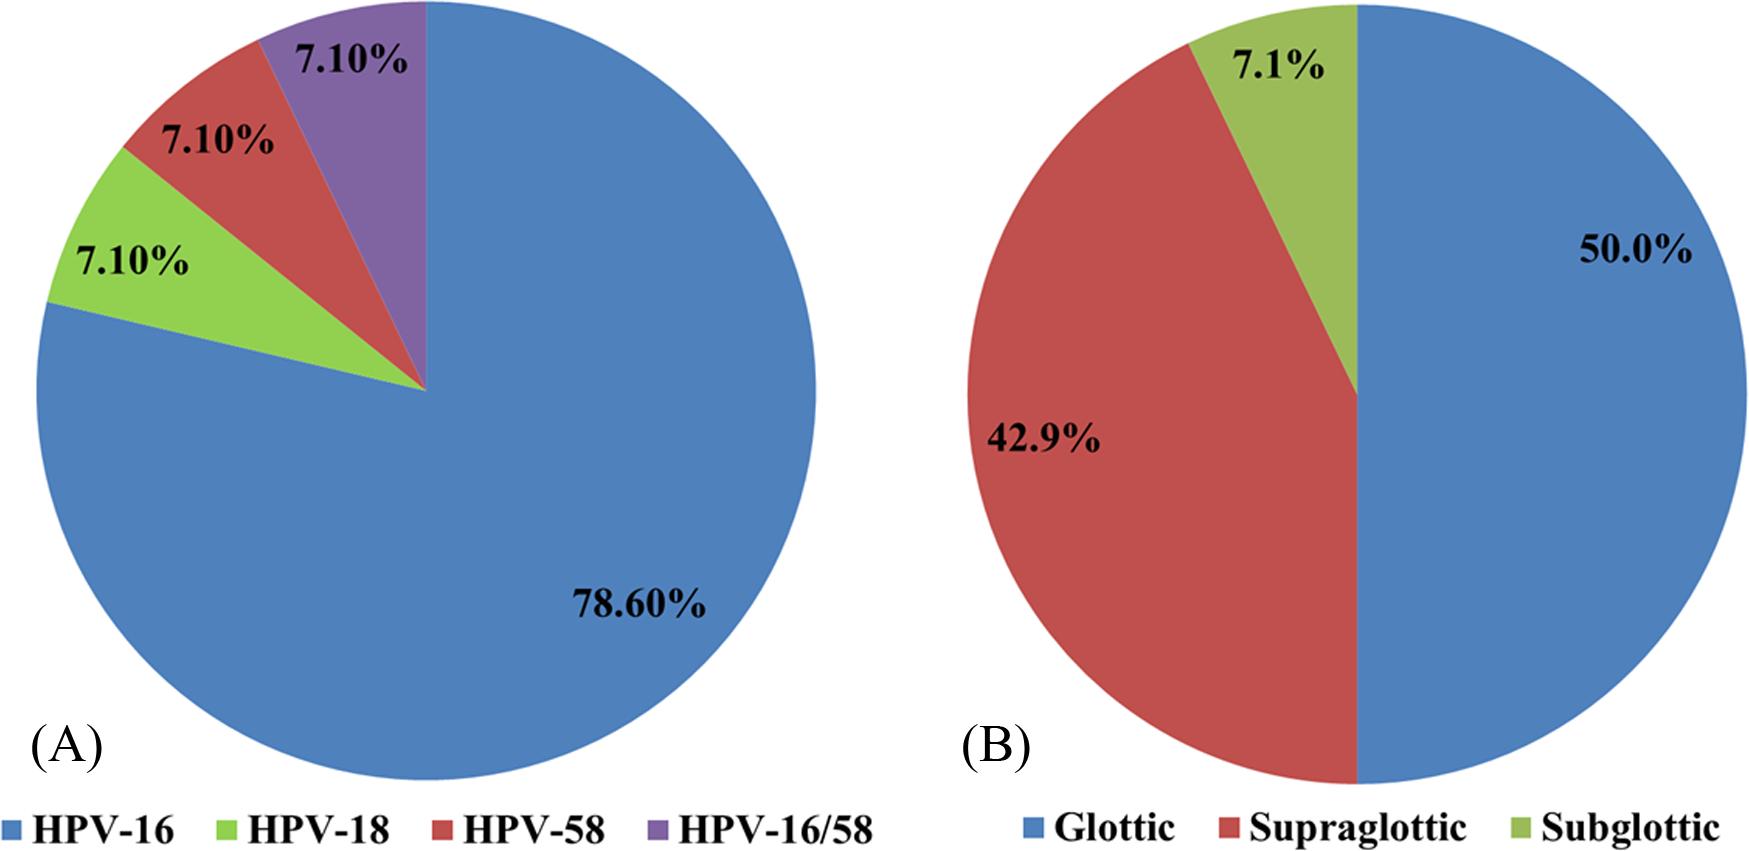 tumore alla gola papilloma virus hpv red genital warts